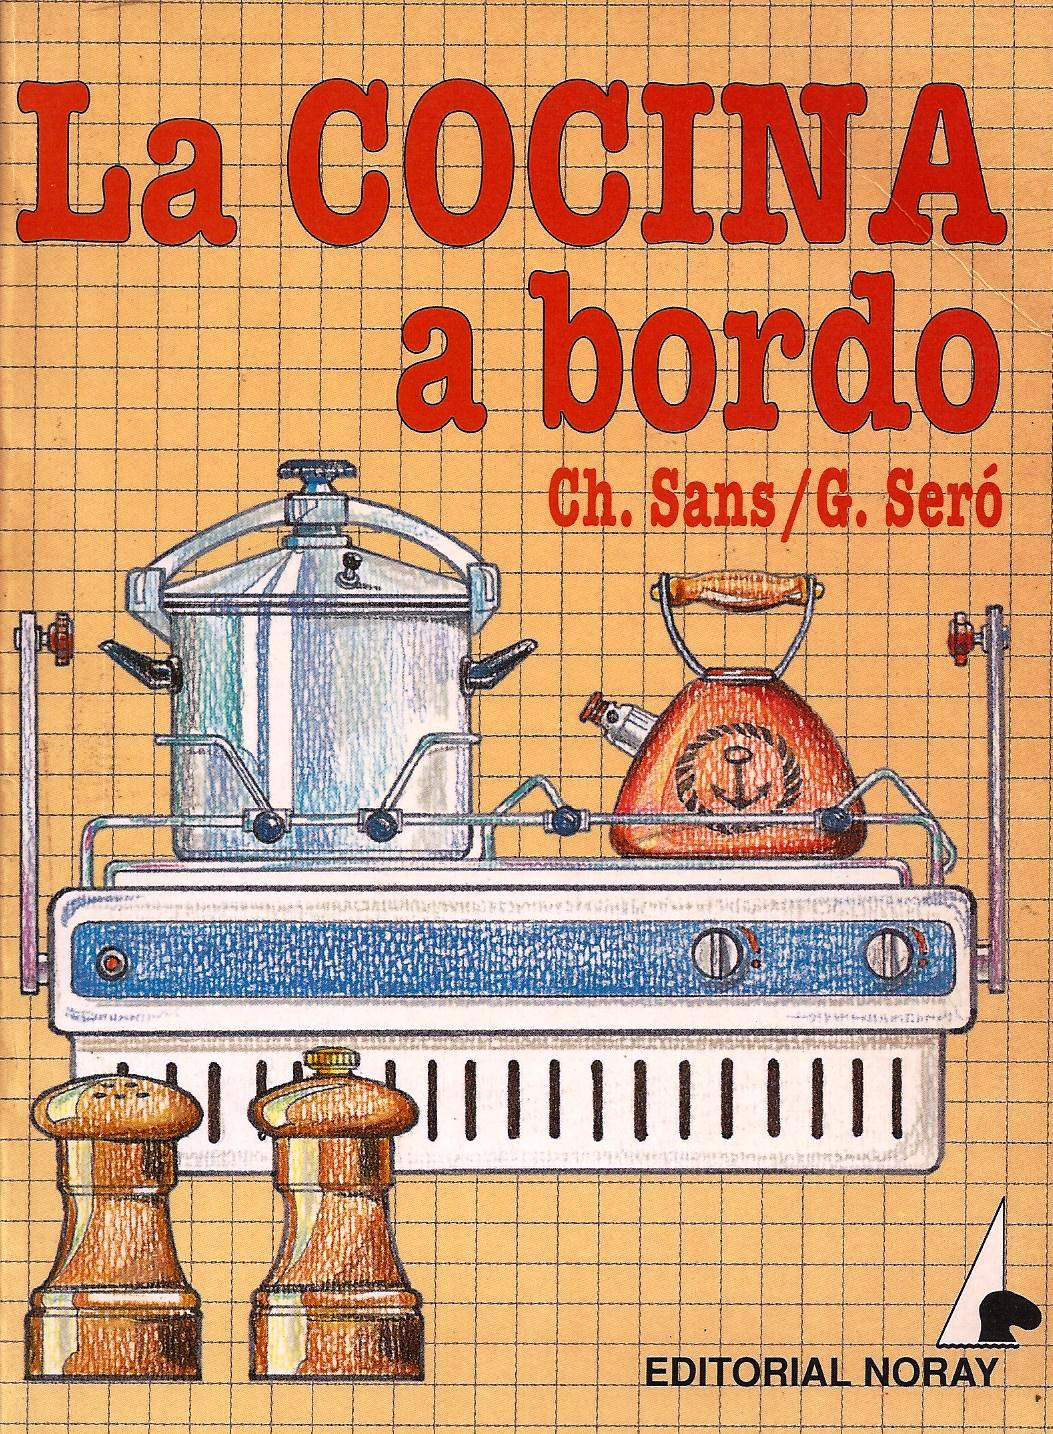 Gastromimix libros de cocina con un punto especial - Libros de cocina ...